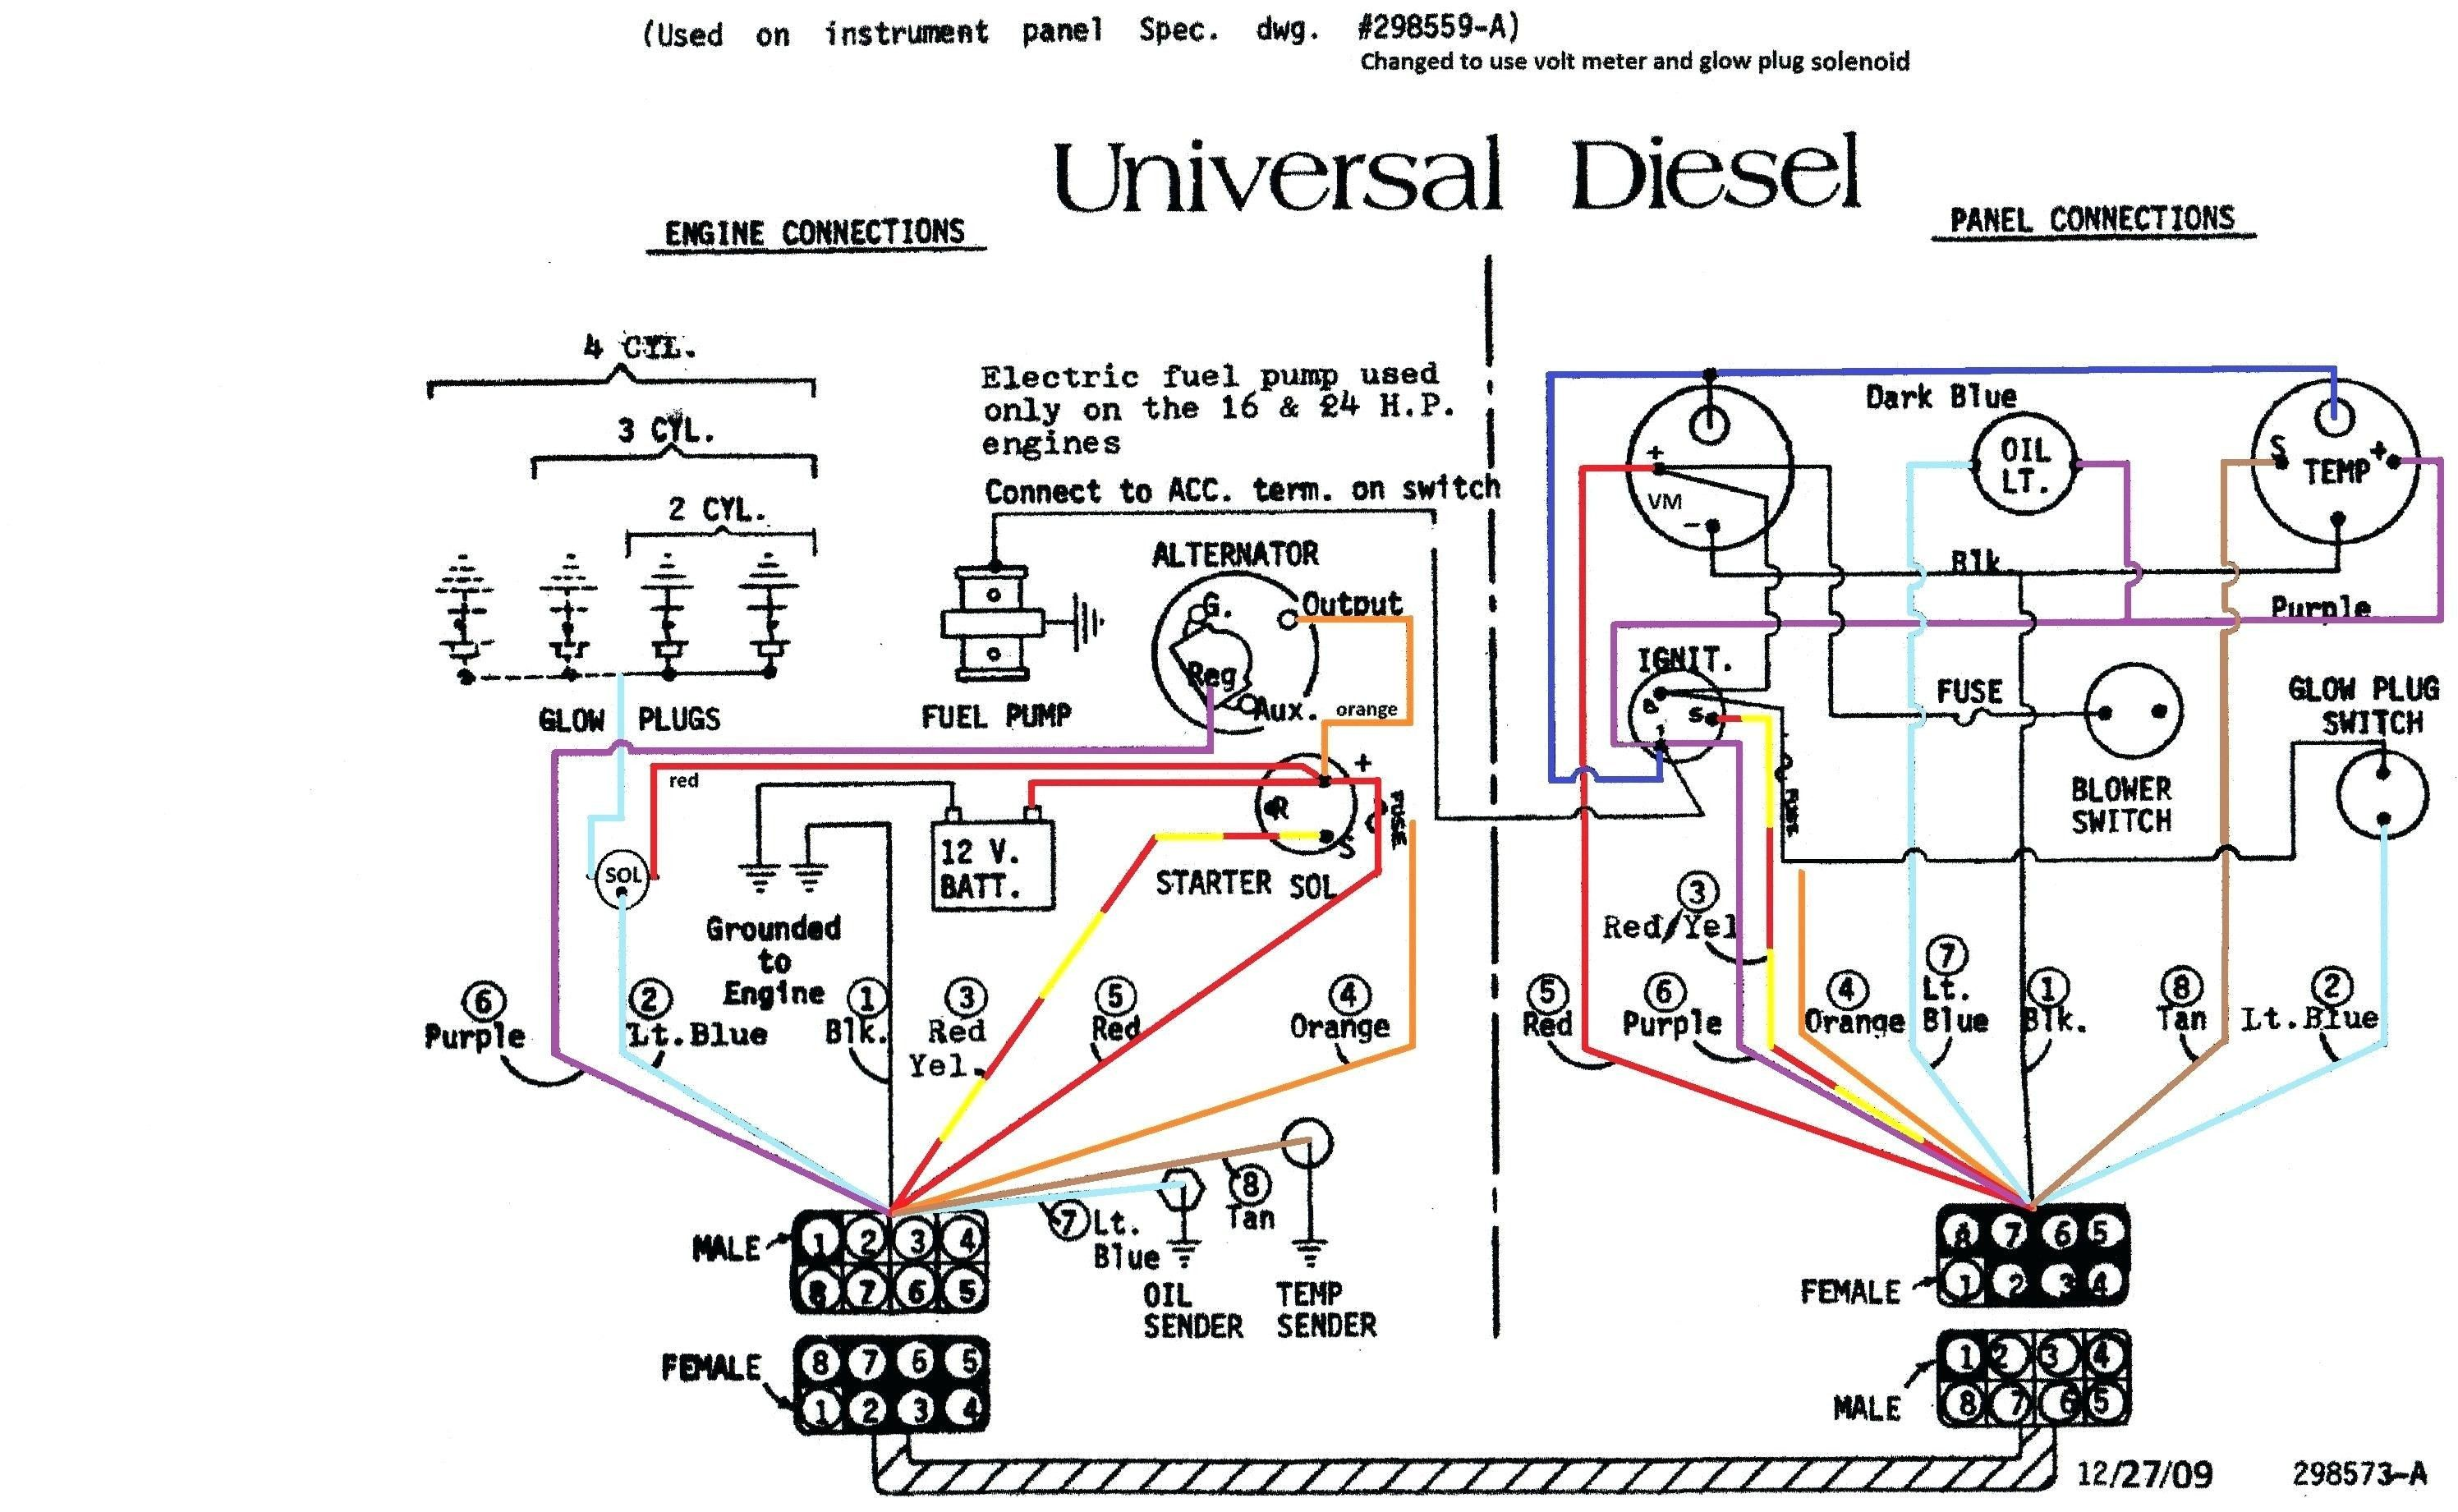 hight resolution of powerline alternator wiring diagram wiring diagrams powerline alternator wiring diagram